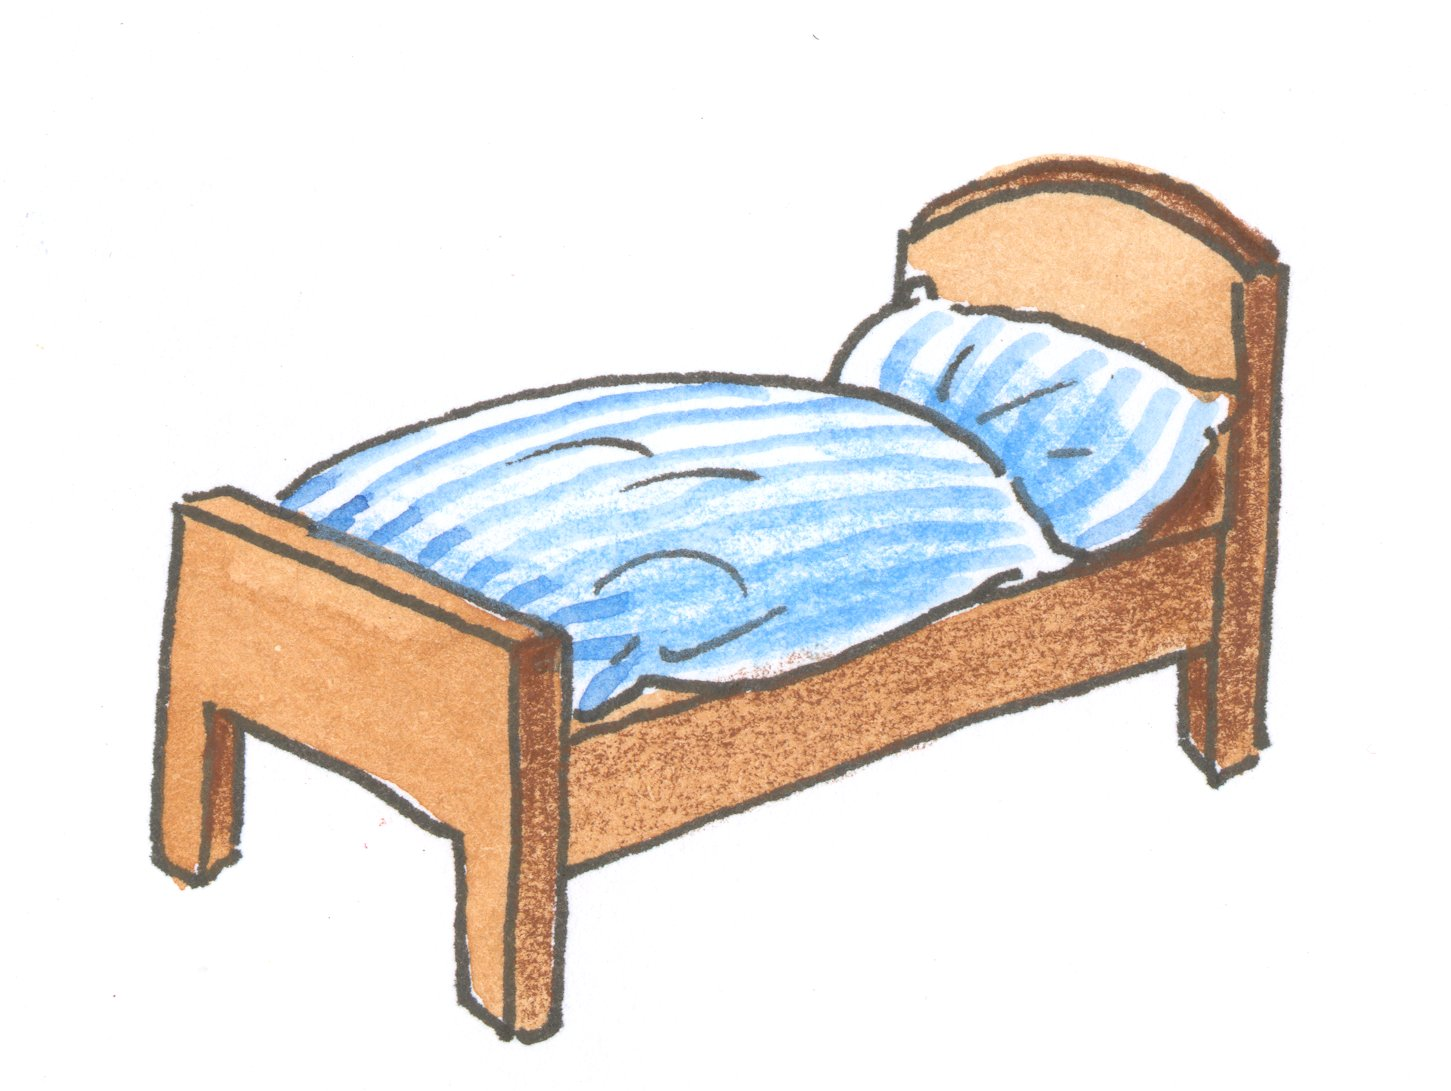 wie nennt man dieses teil am bett am kopf fu ende deutsch wort beschreibung. Black Bedroom Furniture Sets. Home Design Ideas